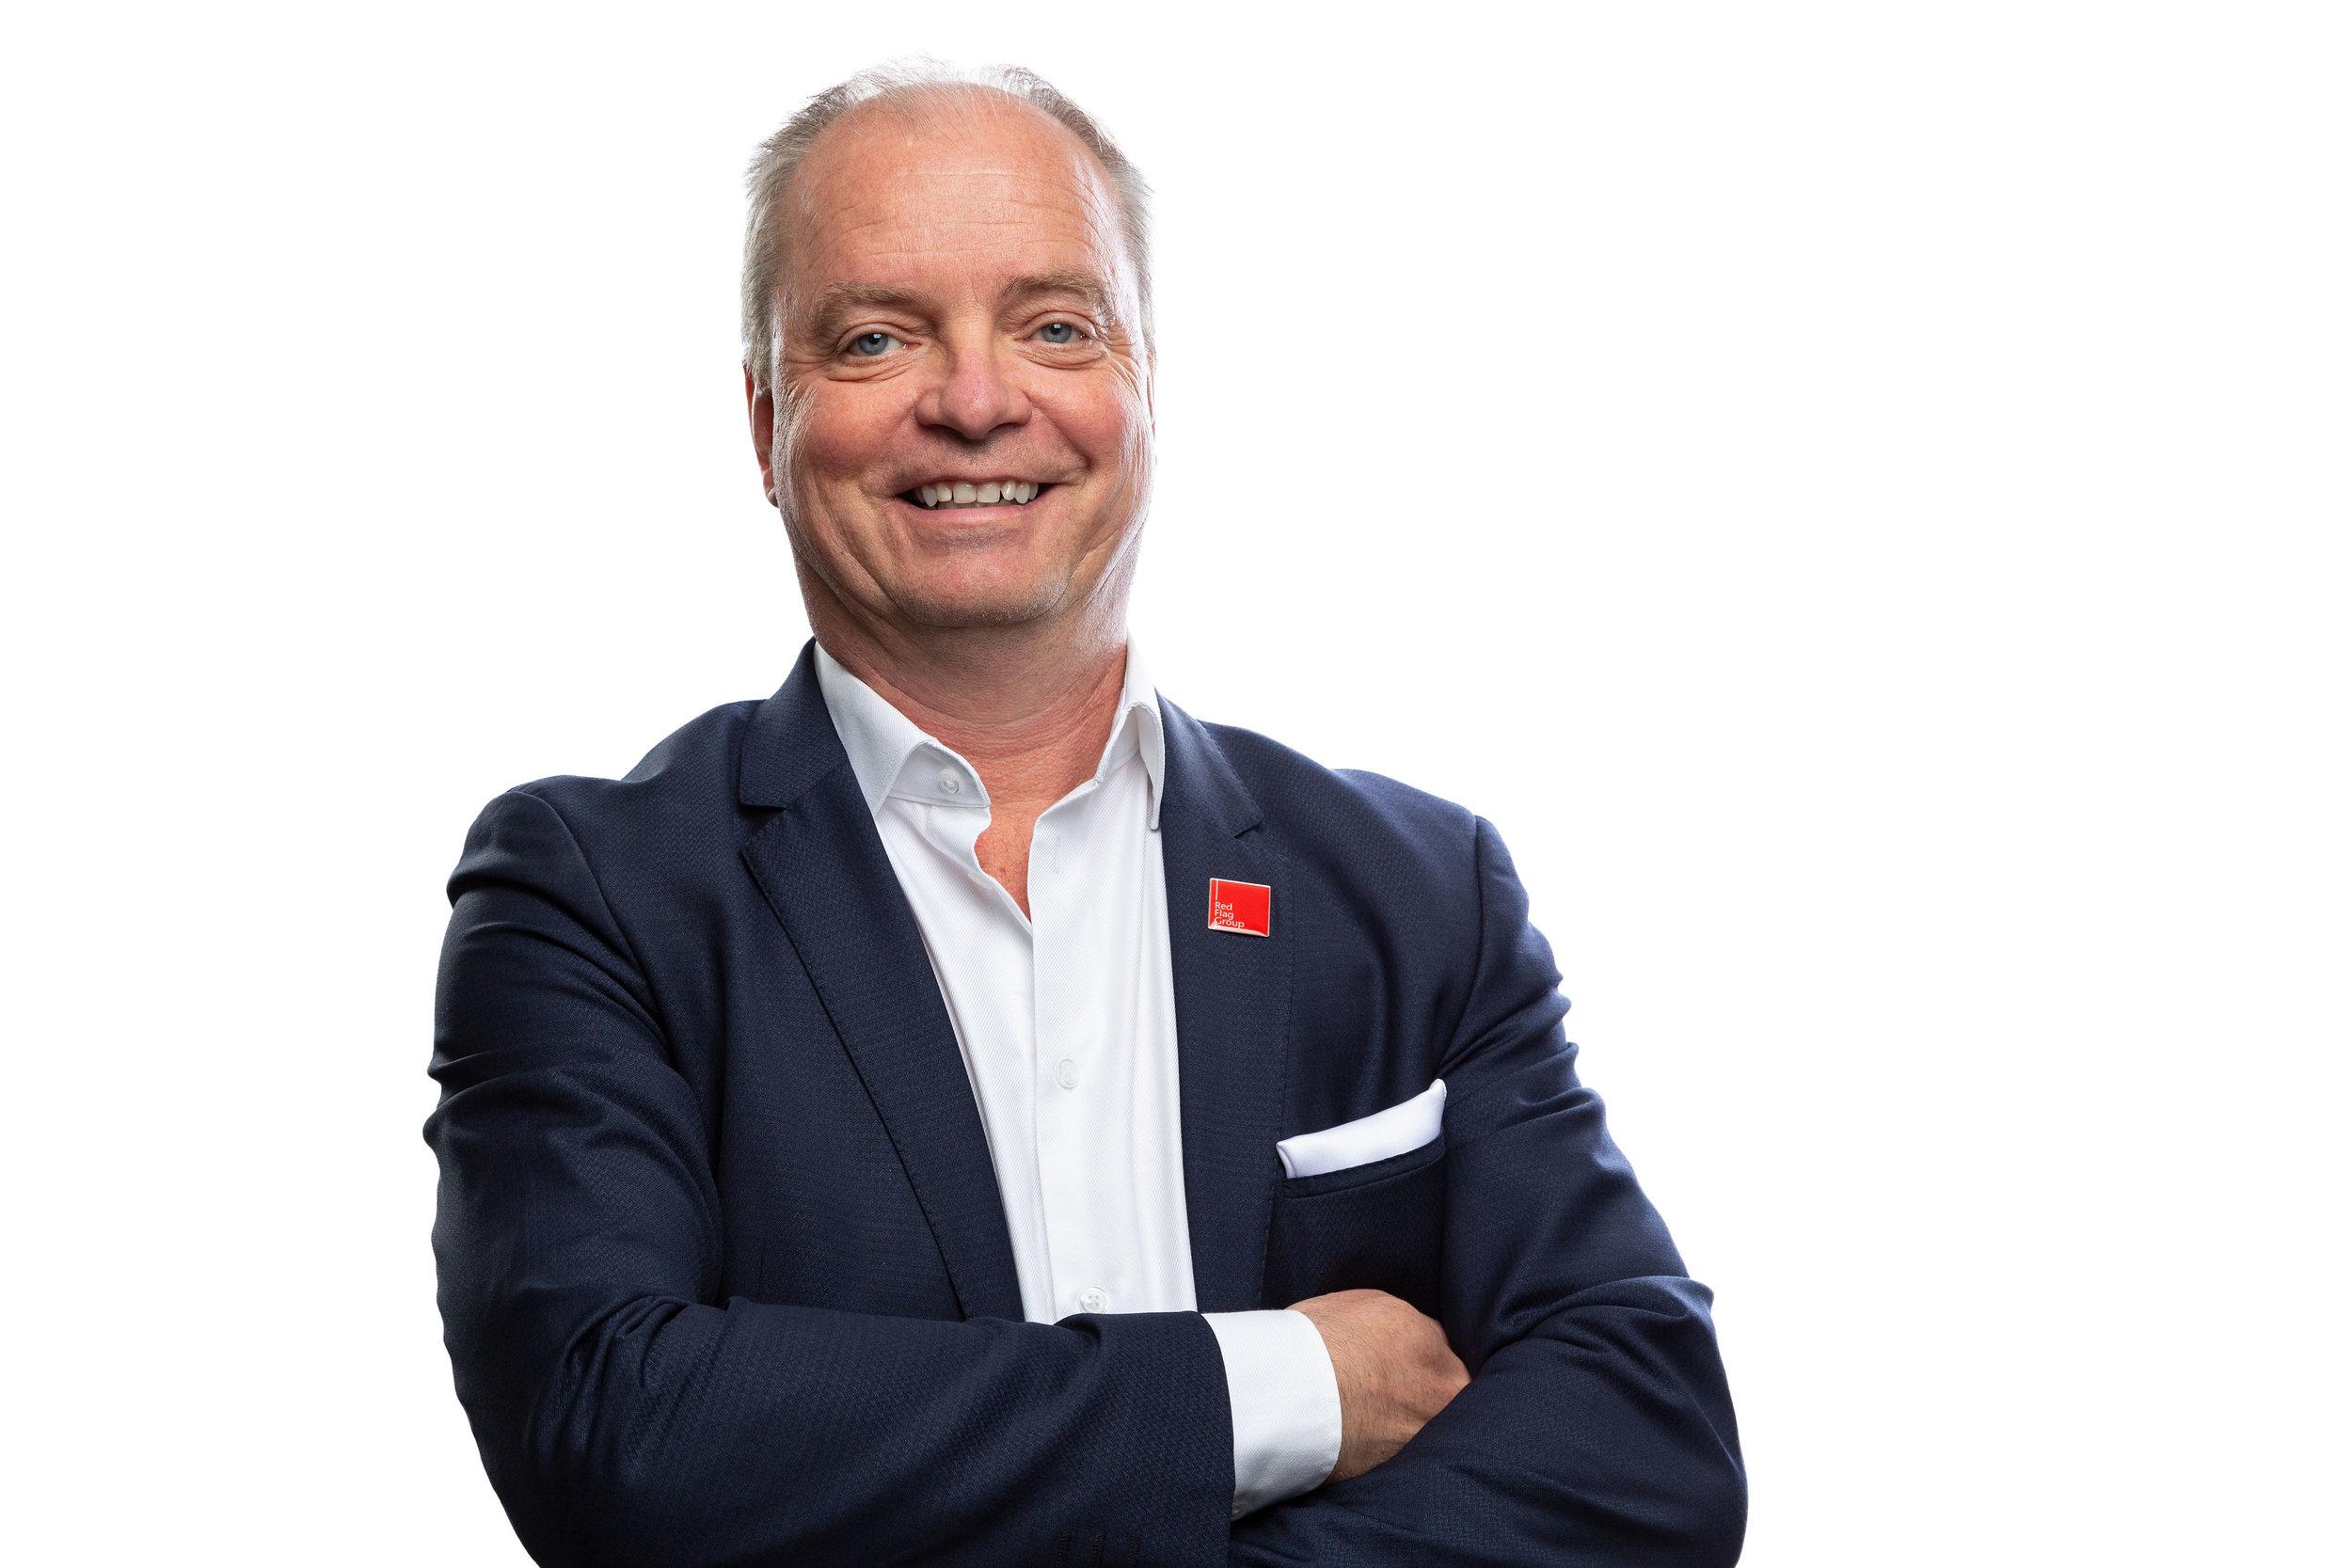 Flemming Thomsen - Nordics   Flemming.Thomsen@redflaggroup.com